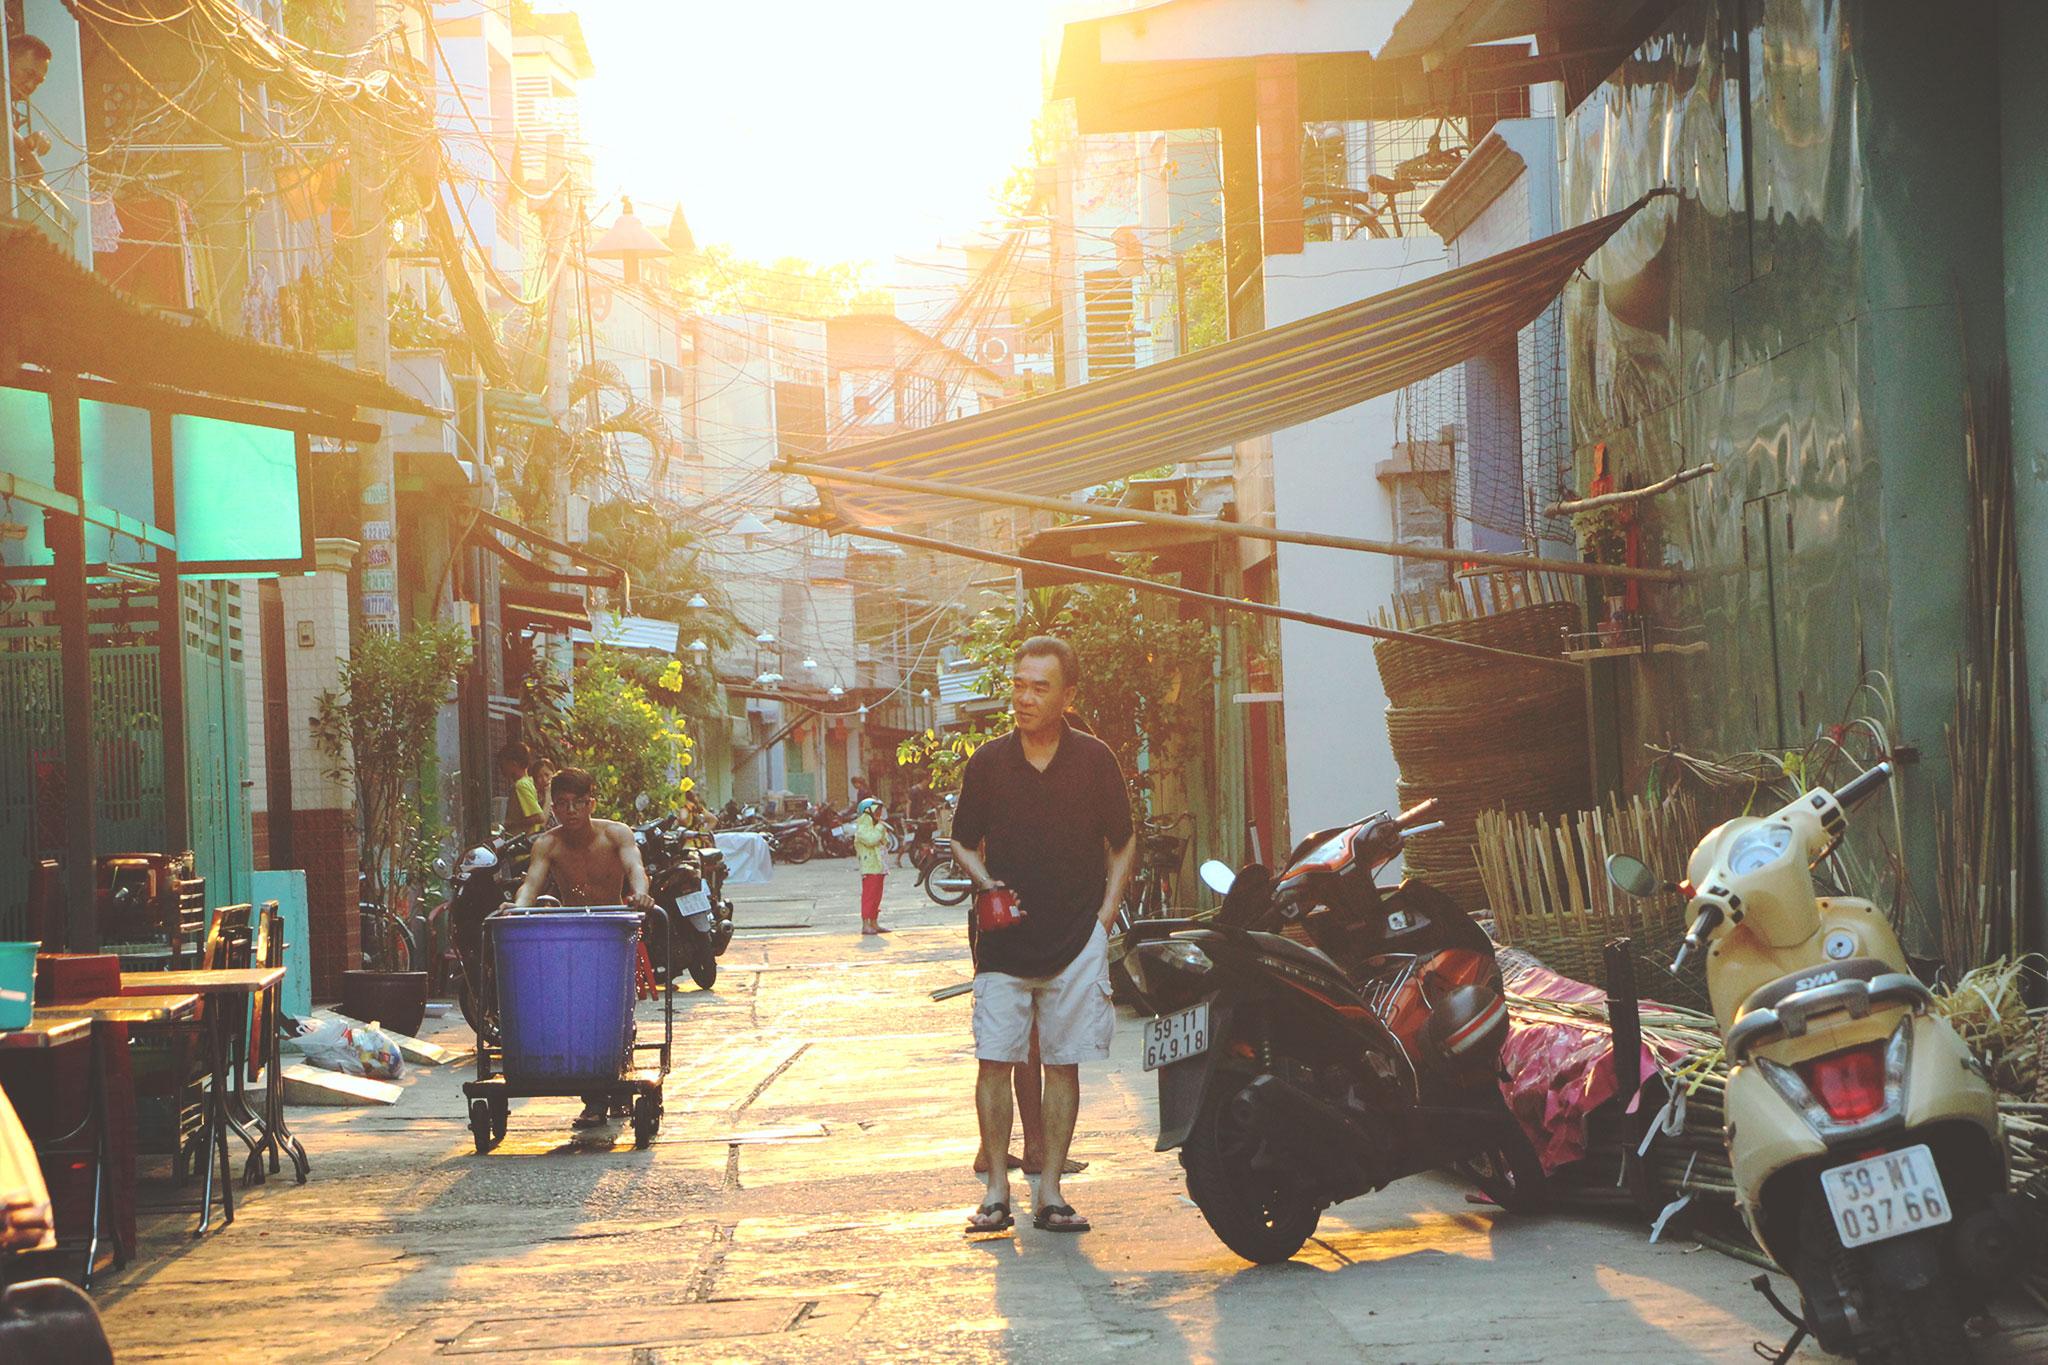 A corner of Chinatown